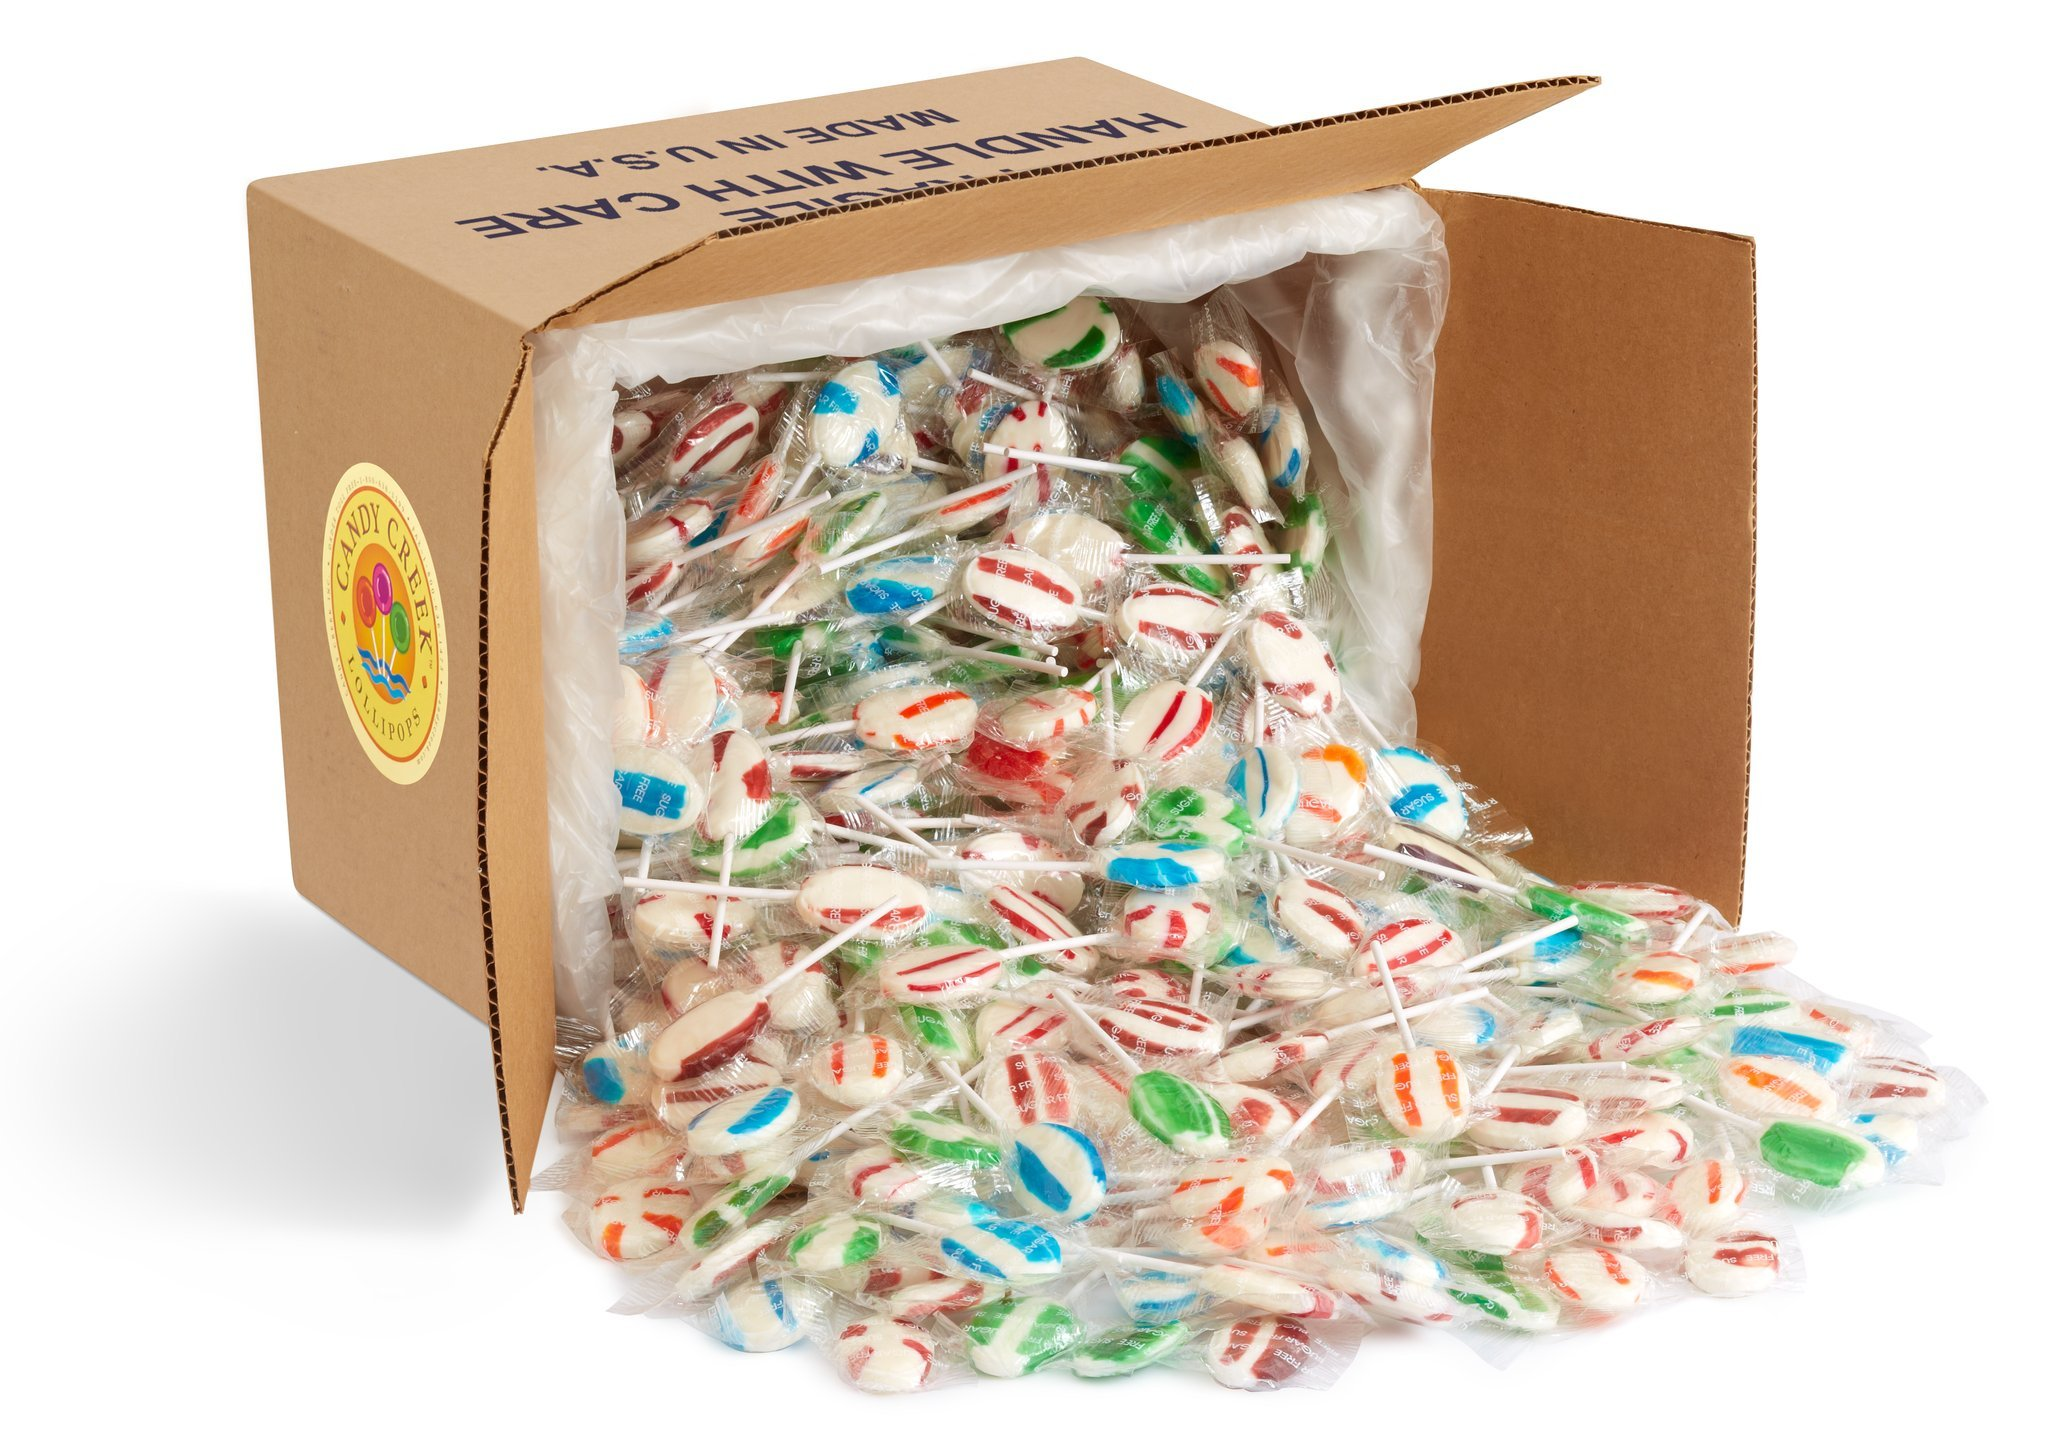 Candy Creek Sugar Free Fruit Zany Oval Lollipops, 12 lb. Bulk Carton